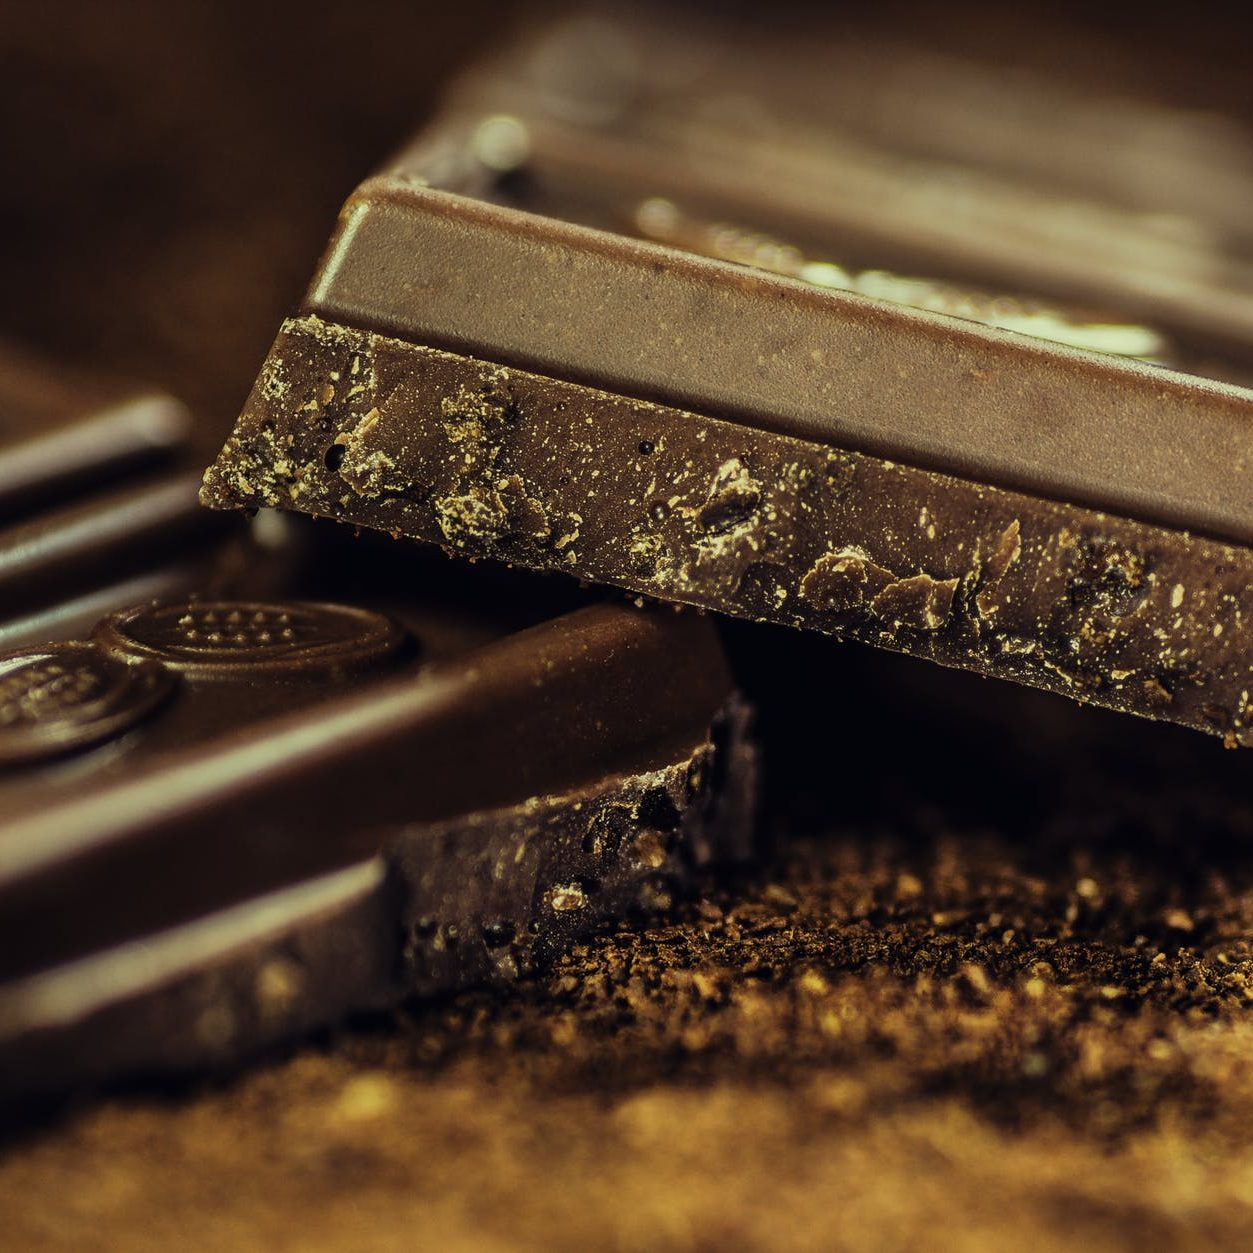 chocolate dark coffee confiserie 65882 1253x1253 1